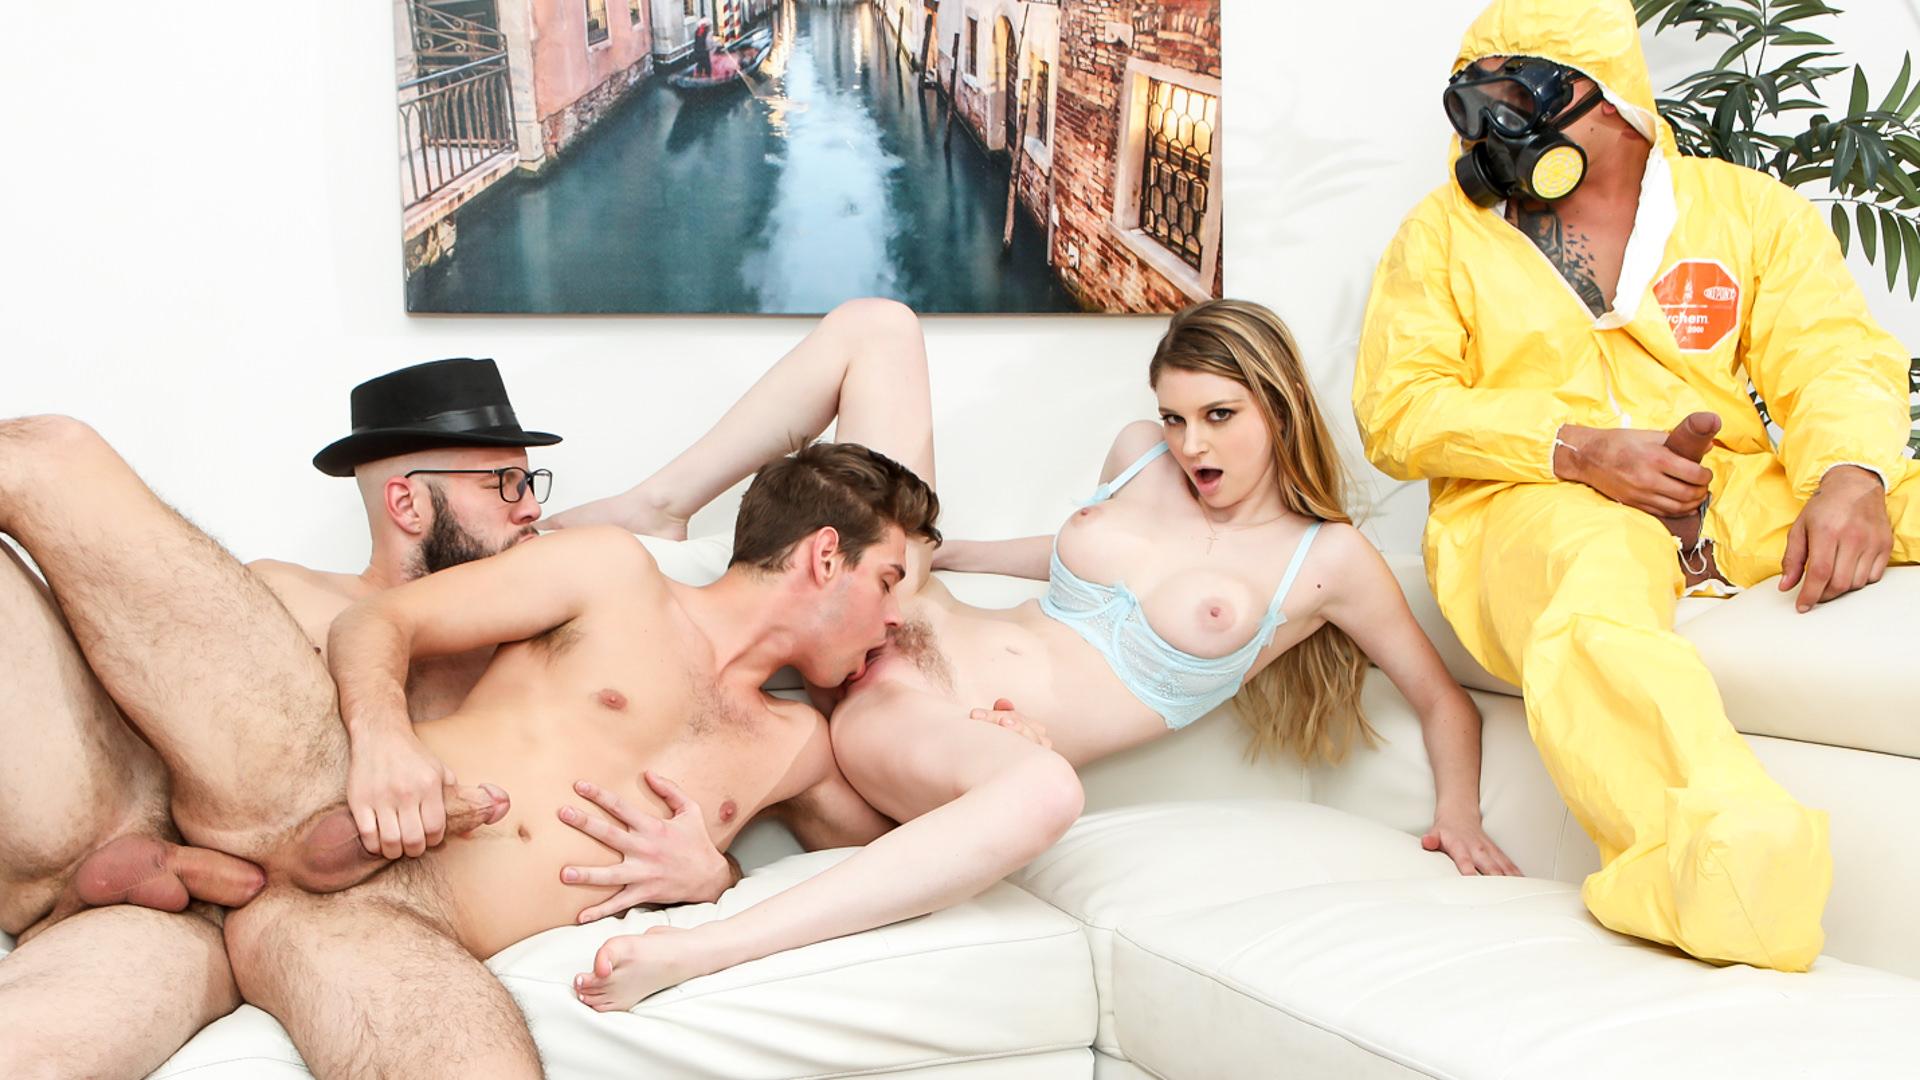 Breaking Bi - Wolf Hudson & Bunny Colby & Bentley Layne & Michael DelRay 1